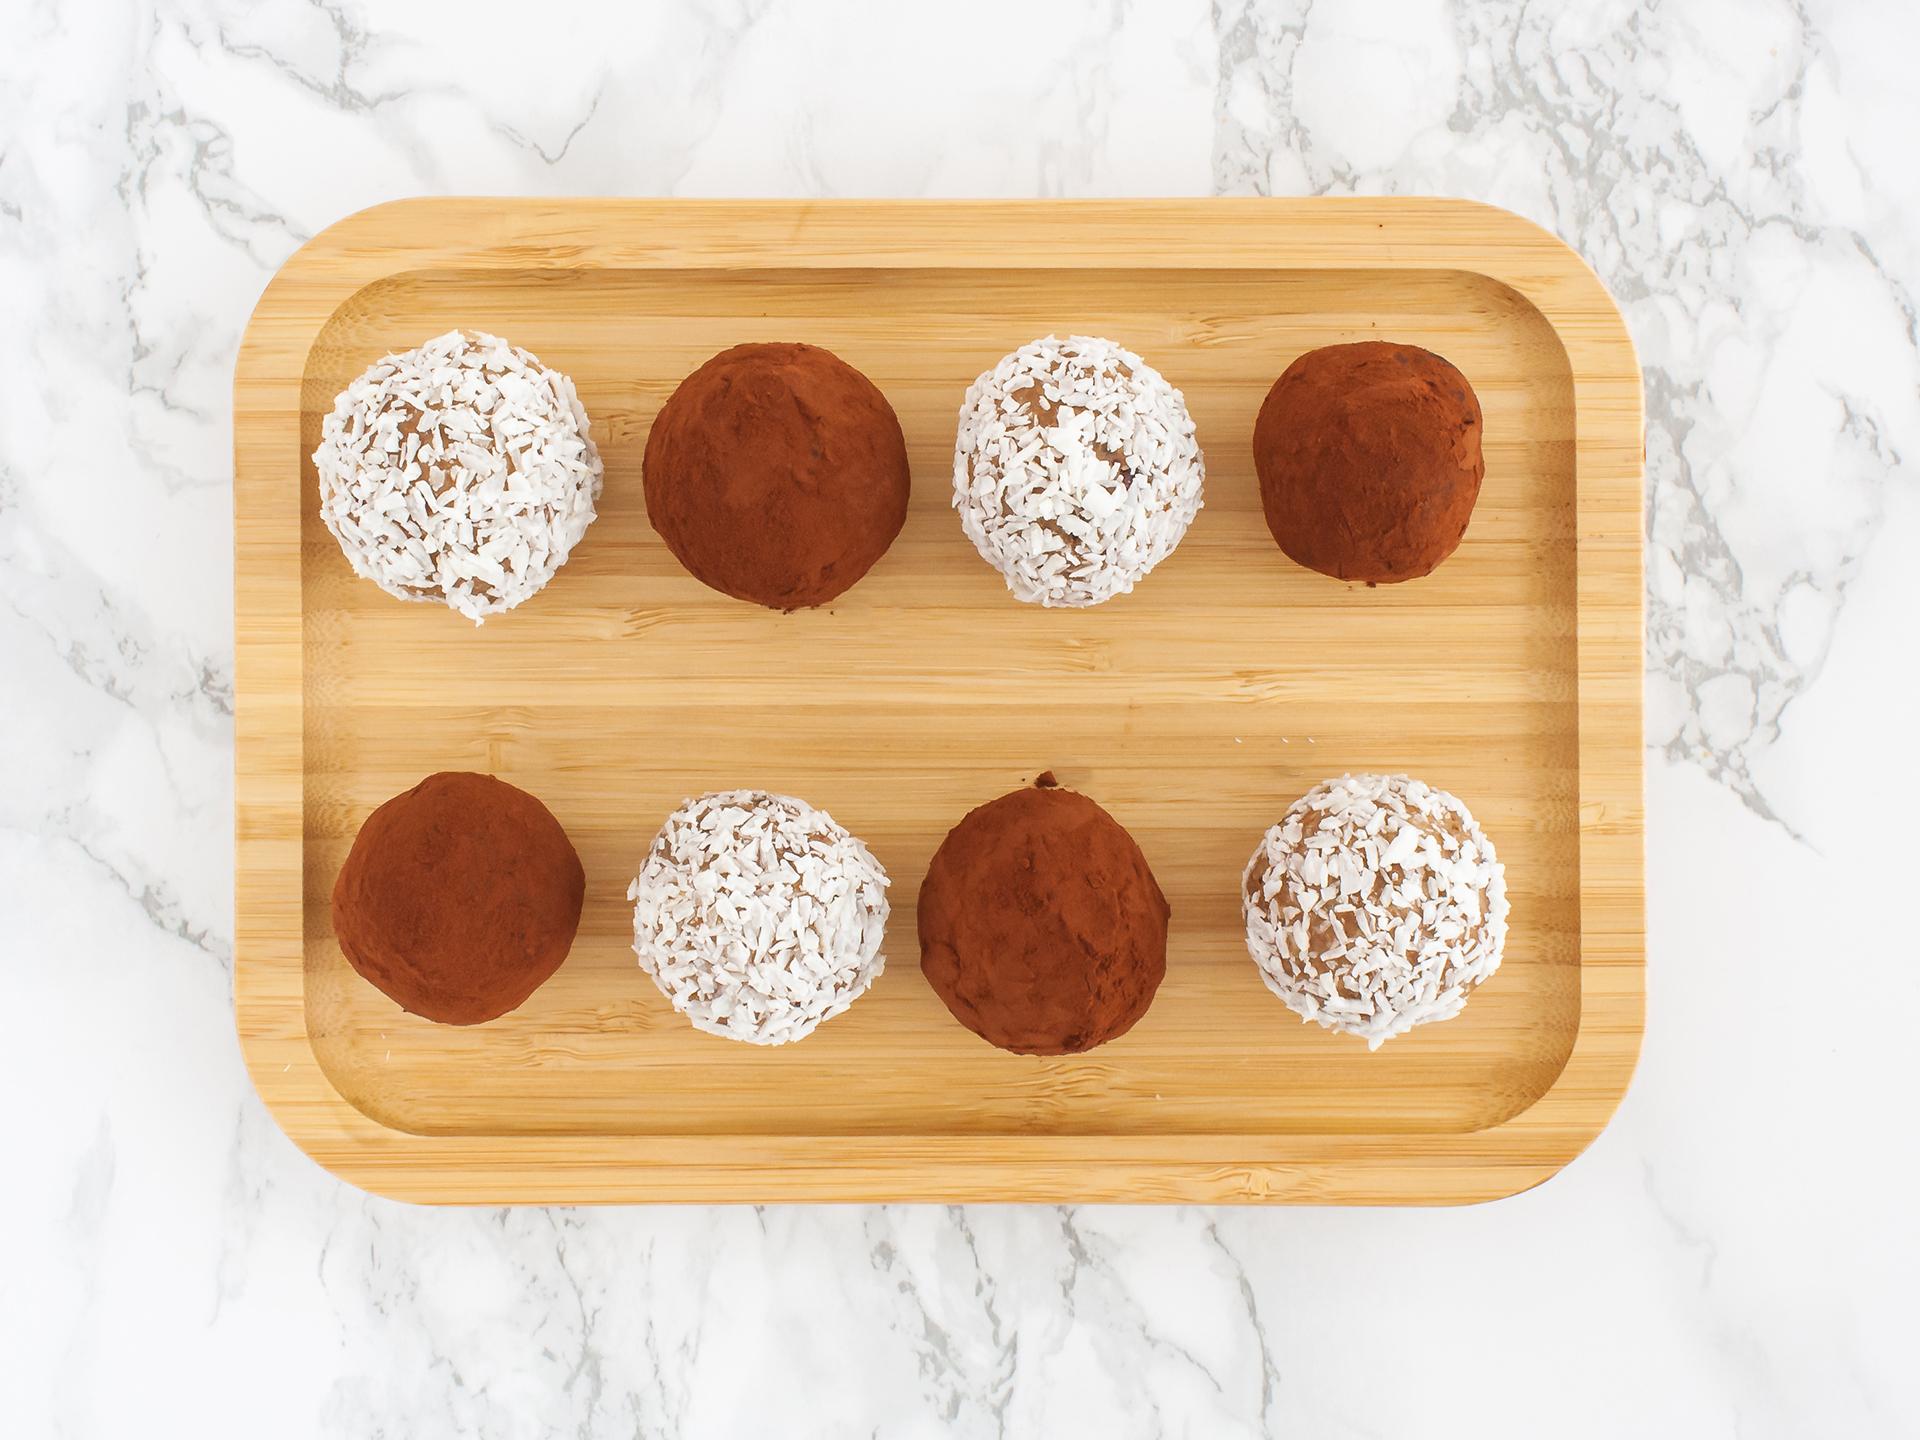 Step 4.1 of Chocolate and Coconut Cashew Truffles Recipe